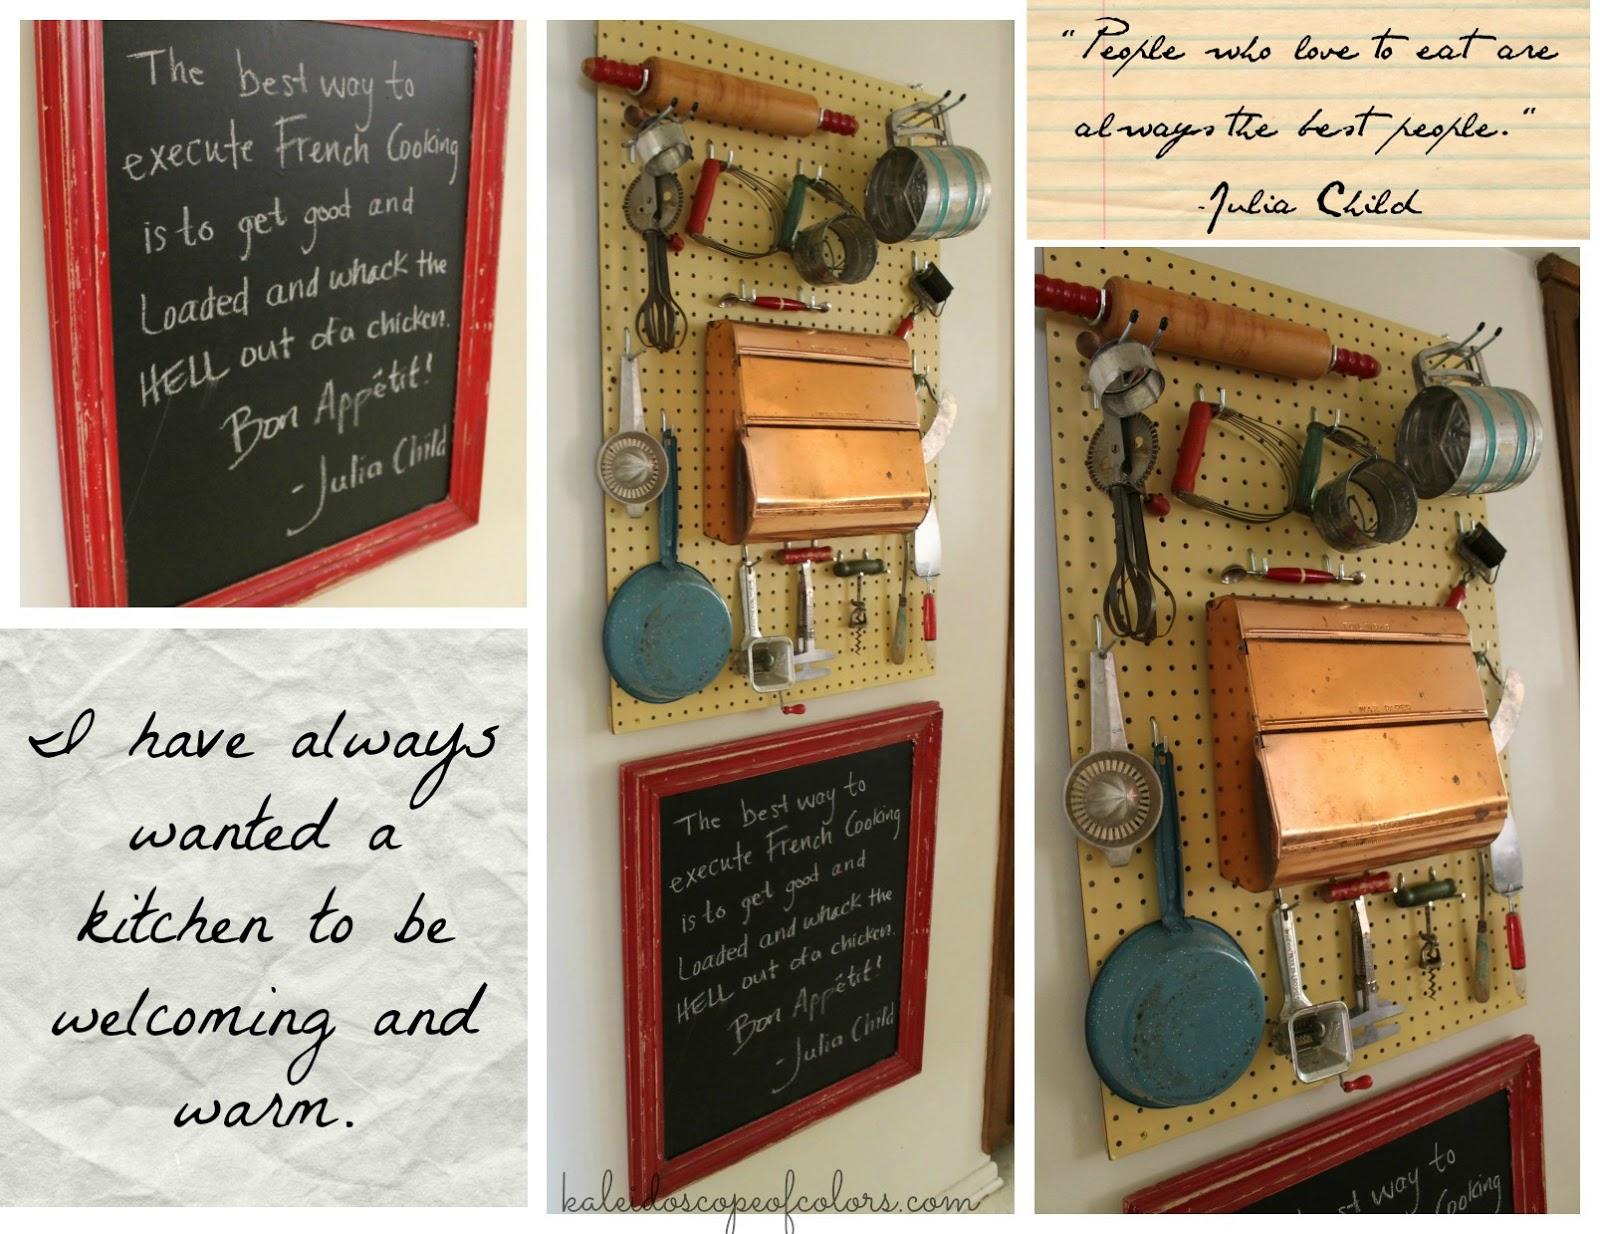 Wall Decor For Kitchen Pinterest : Kaleidoscope of colors thursday s treasure retro kitchen